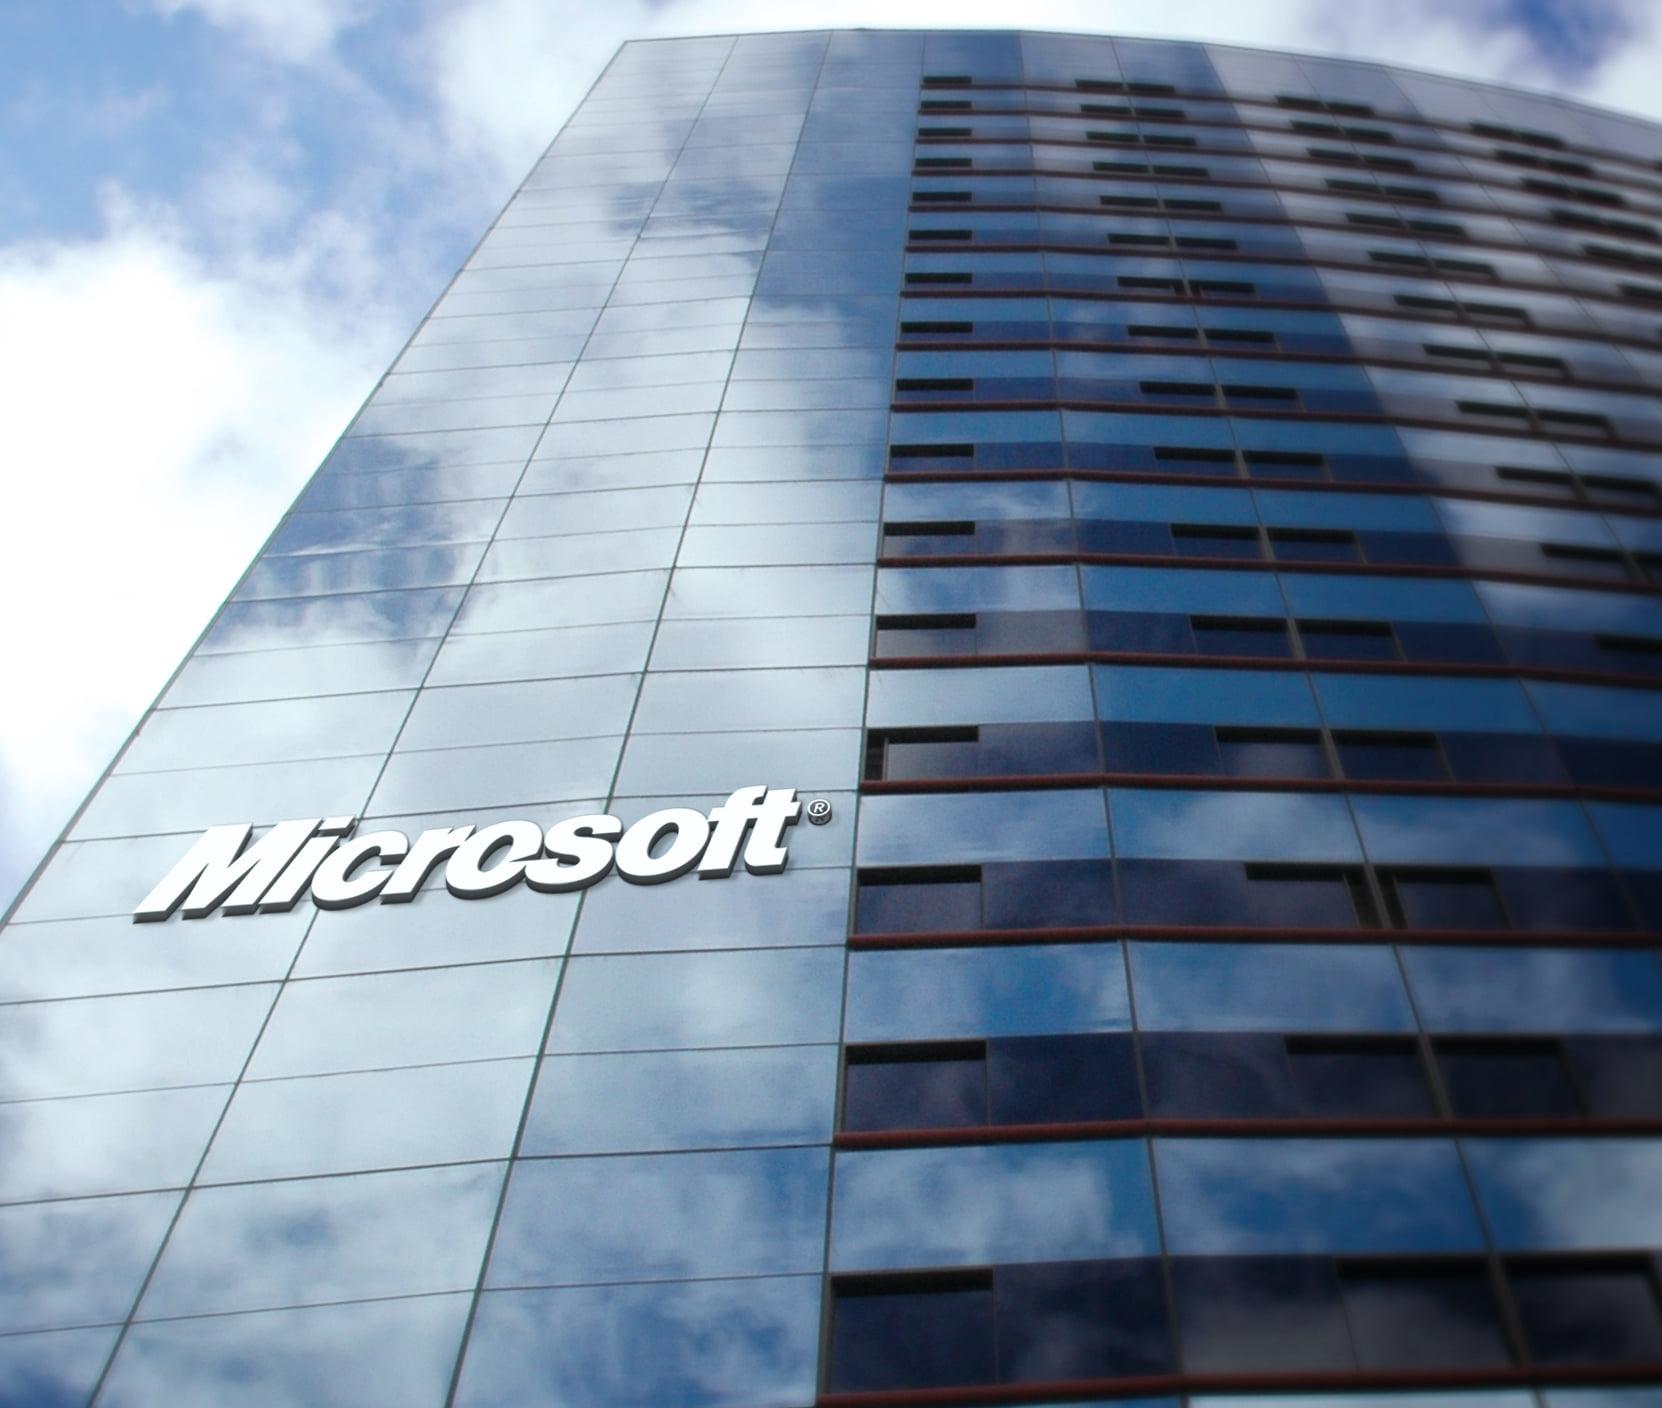 Microsoft-Office-Building-Logo-Mock-Up